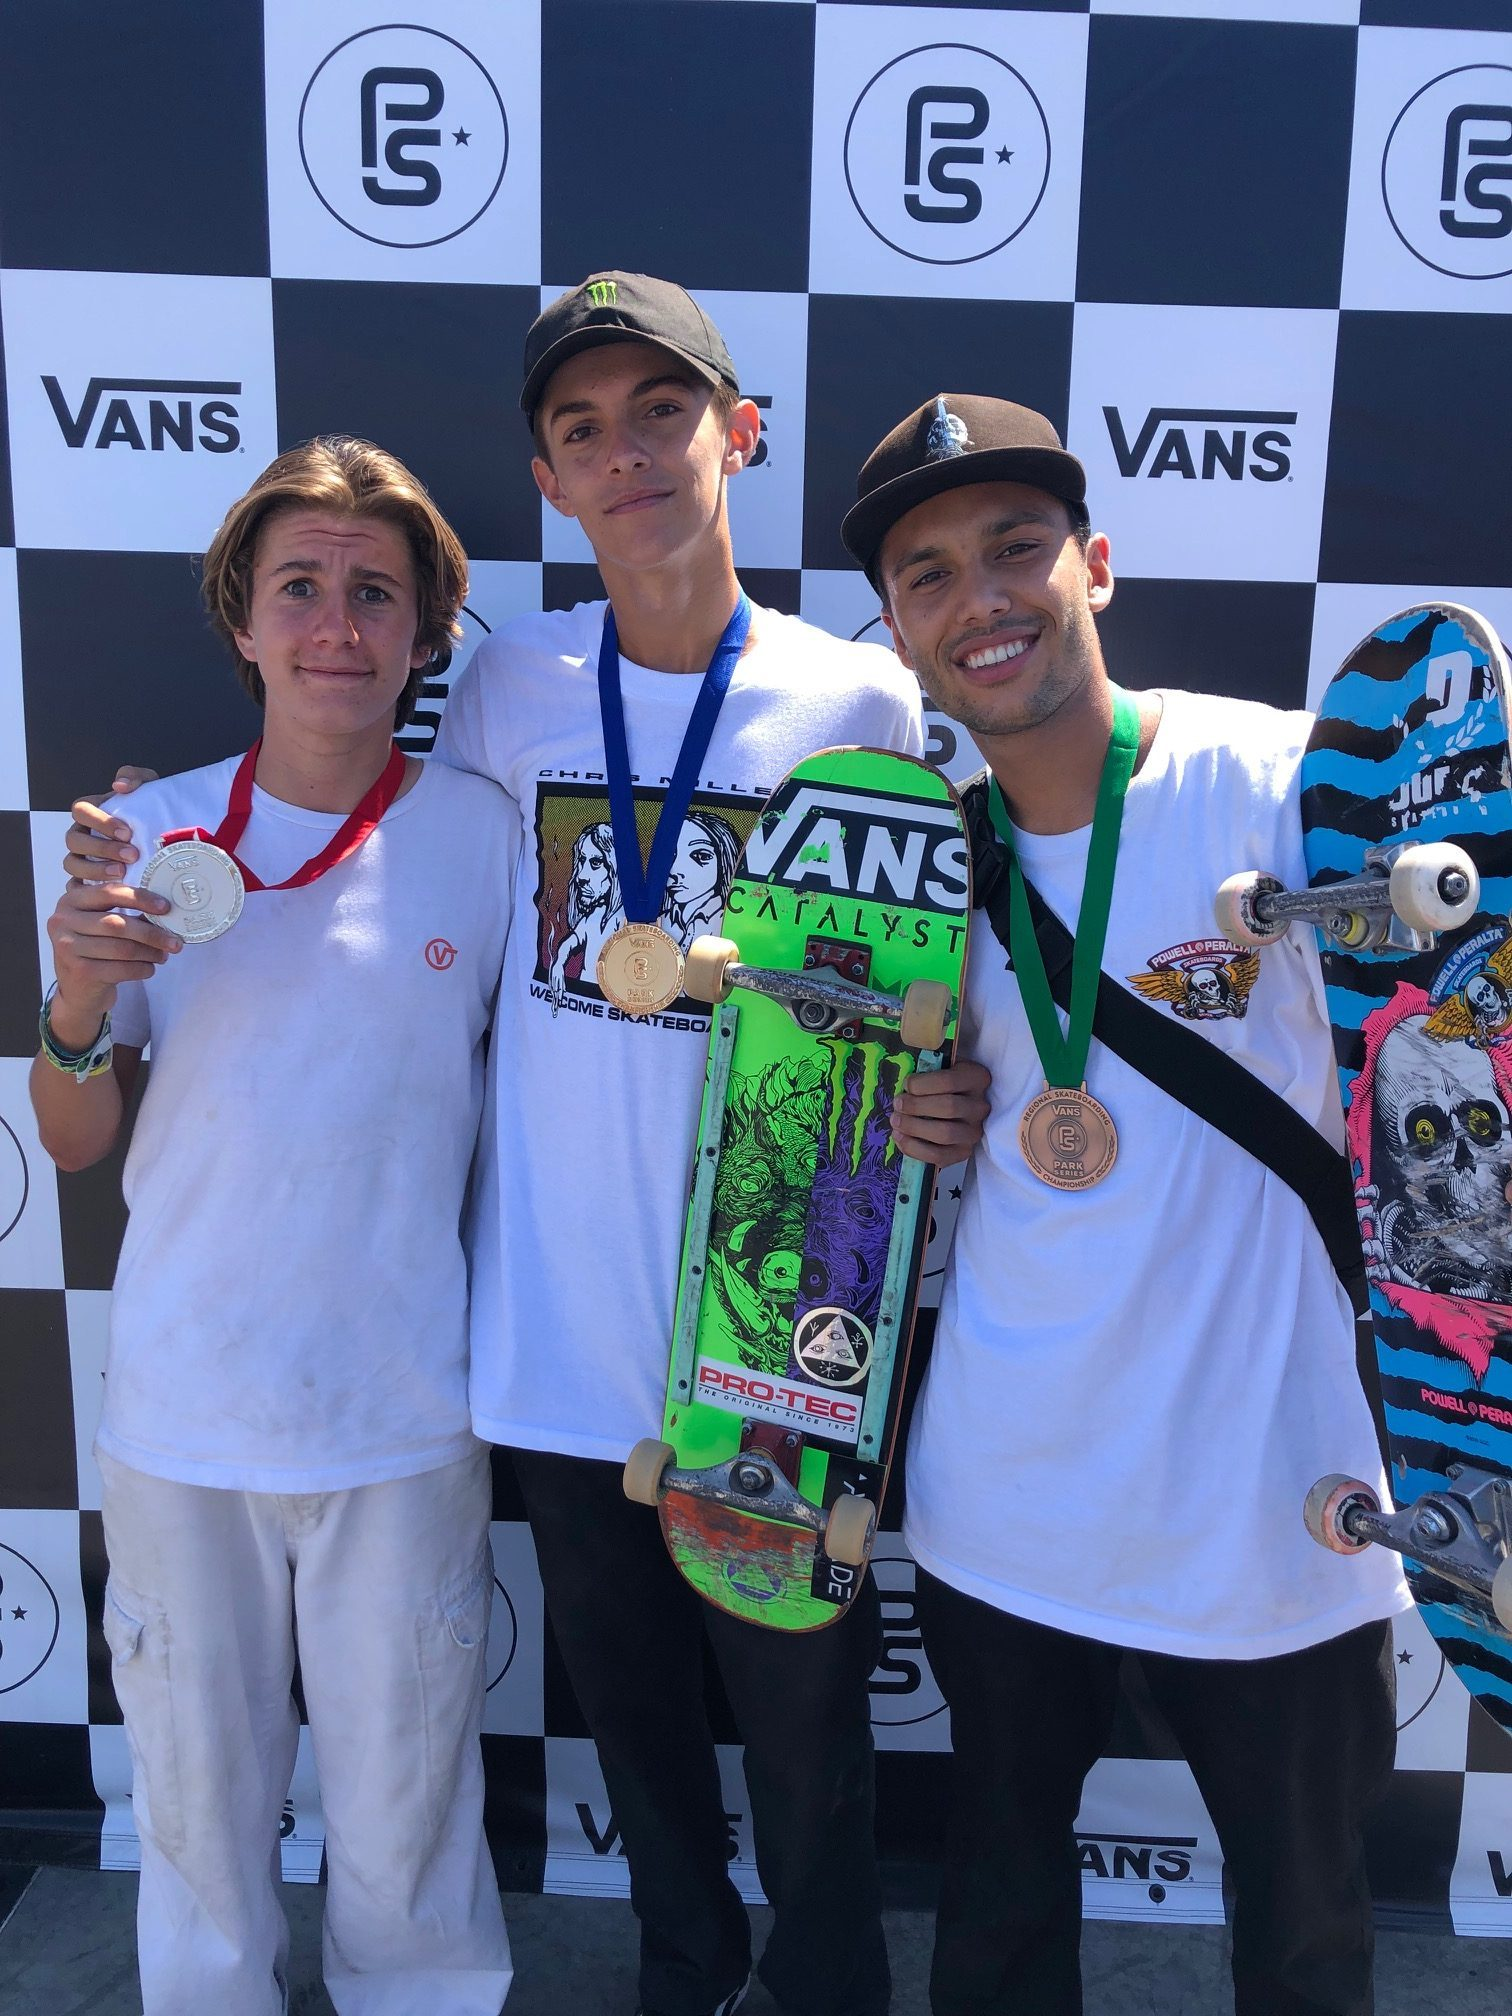 VPS Vans Park Series 2019 Americas Regional Championship Jake Yanko